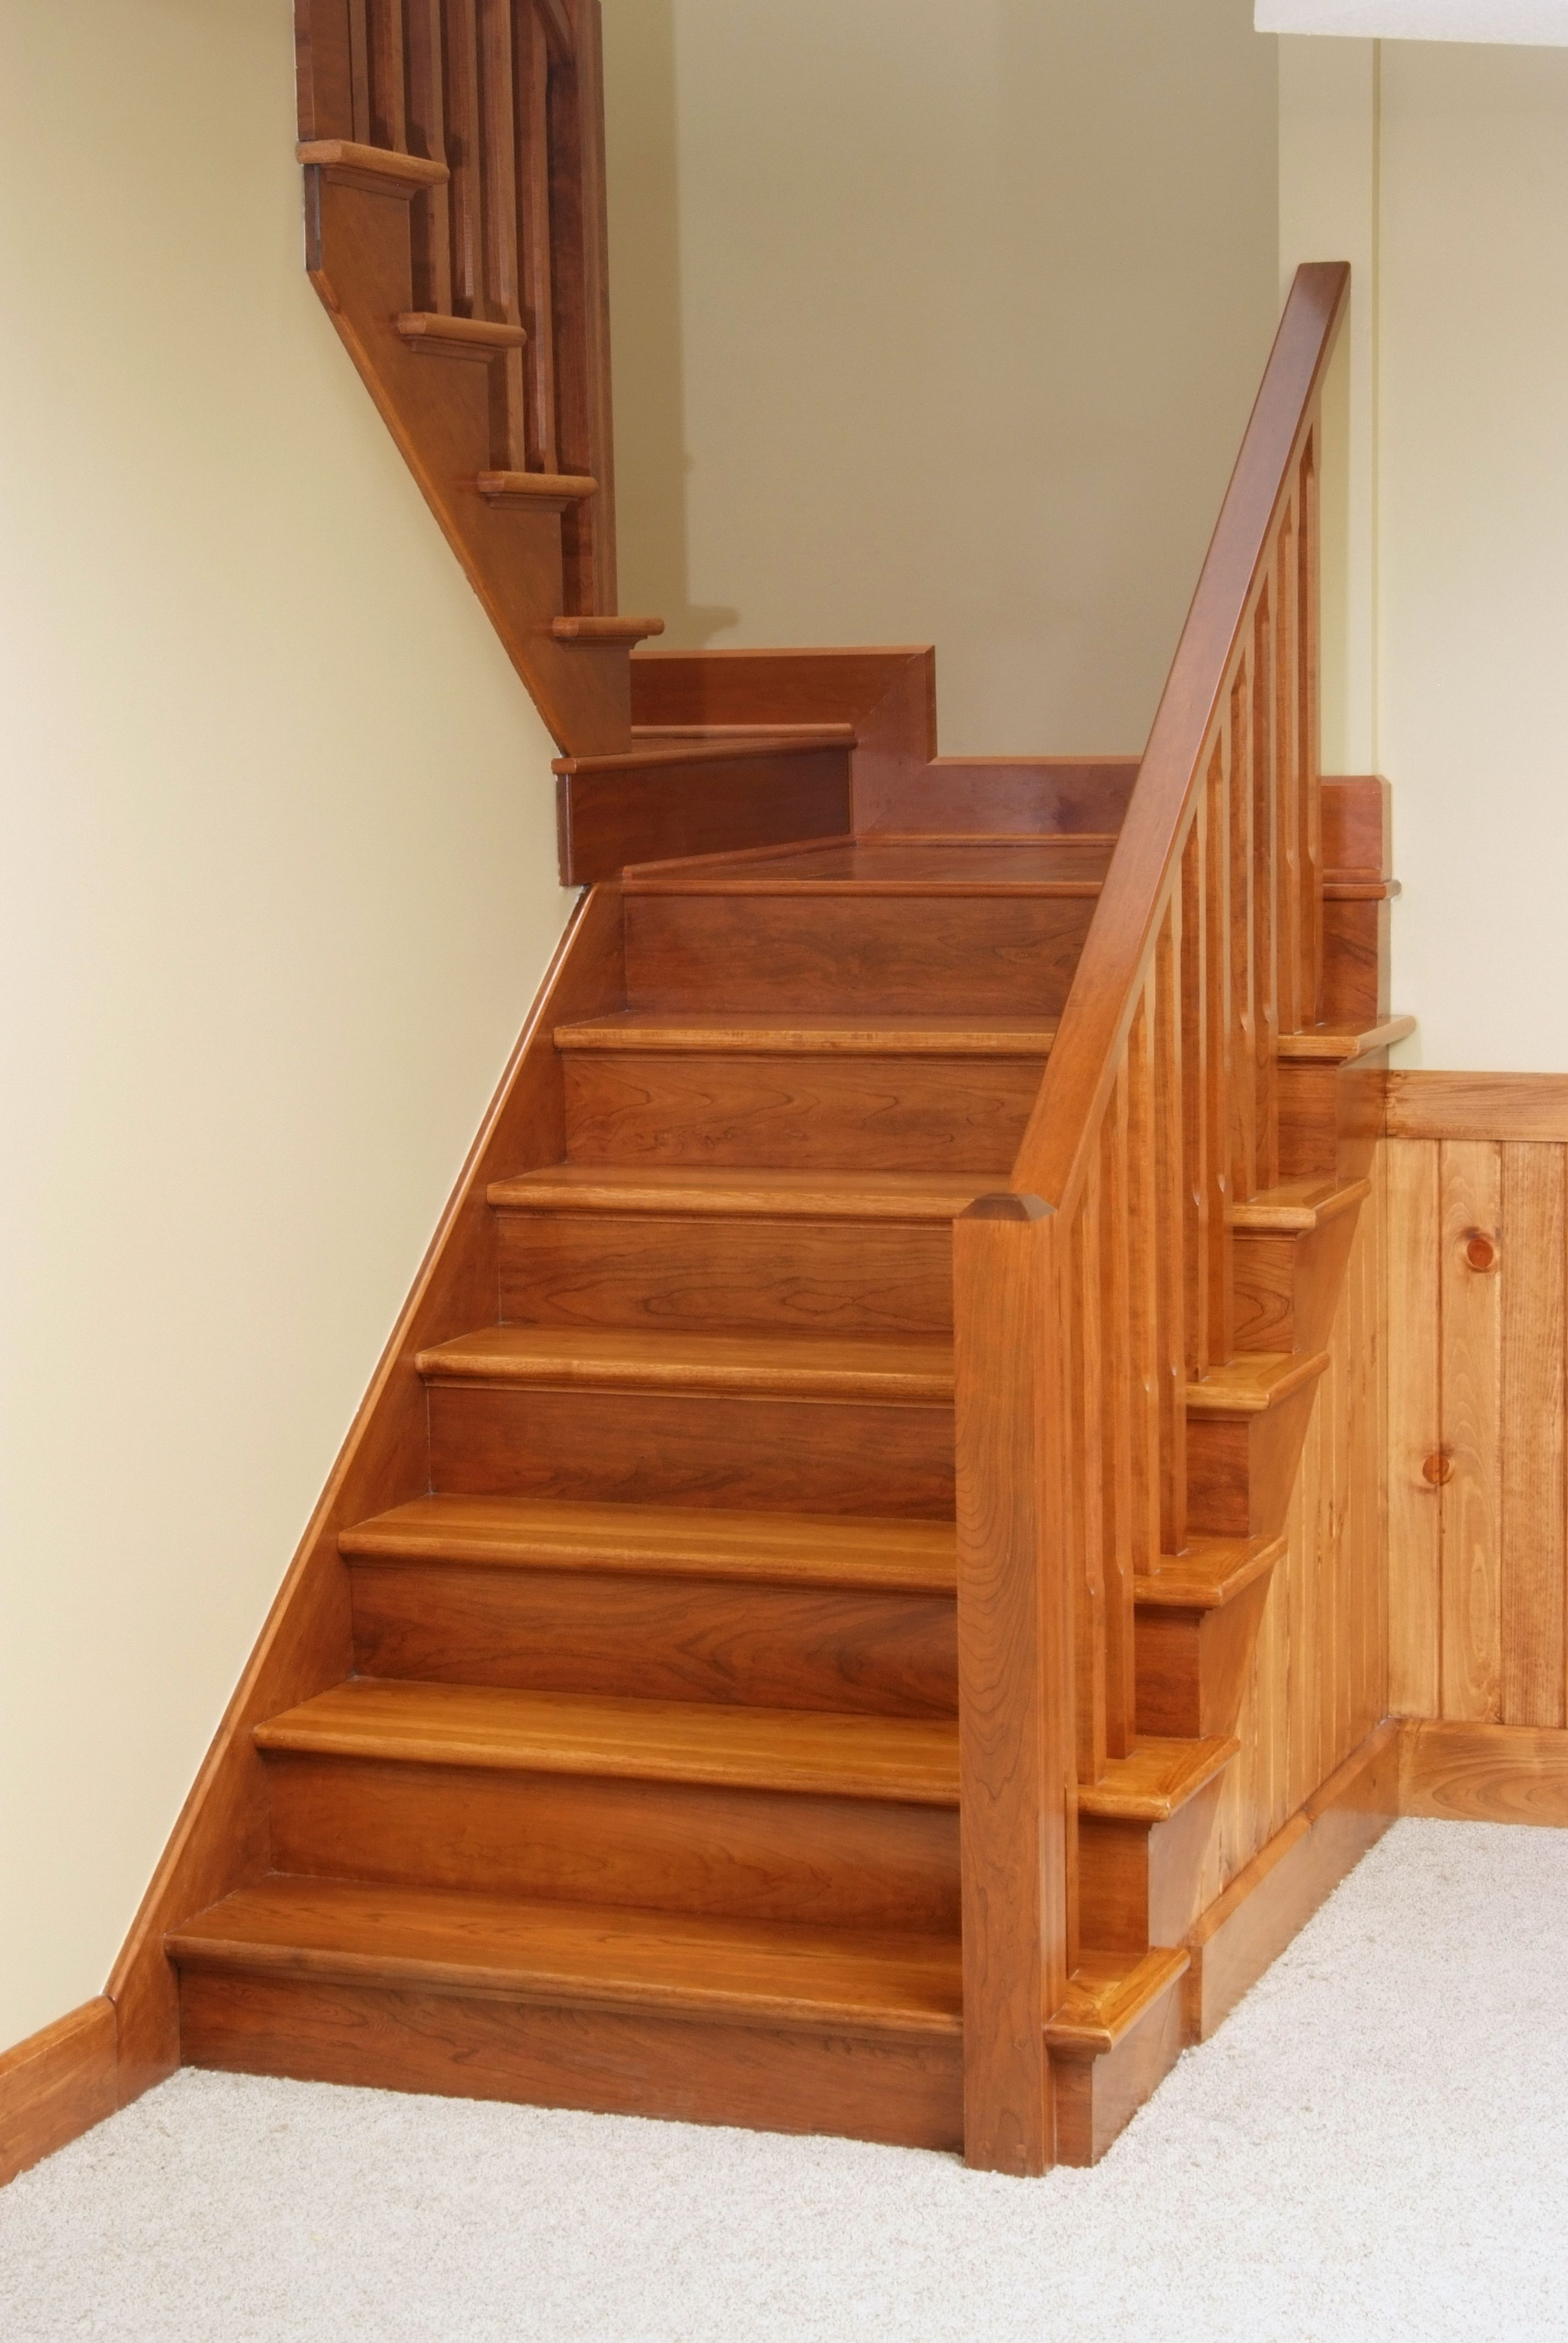 Best B6001 Cherry Contemporary Handrail Bb4000 3 1 2 X 3 1 2 Beveled Top Newel Posts Bbc5360 1 400 x 300